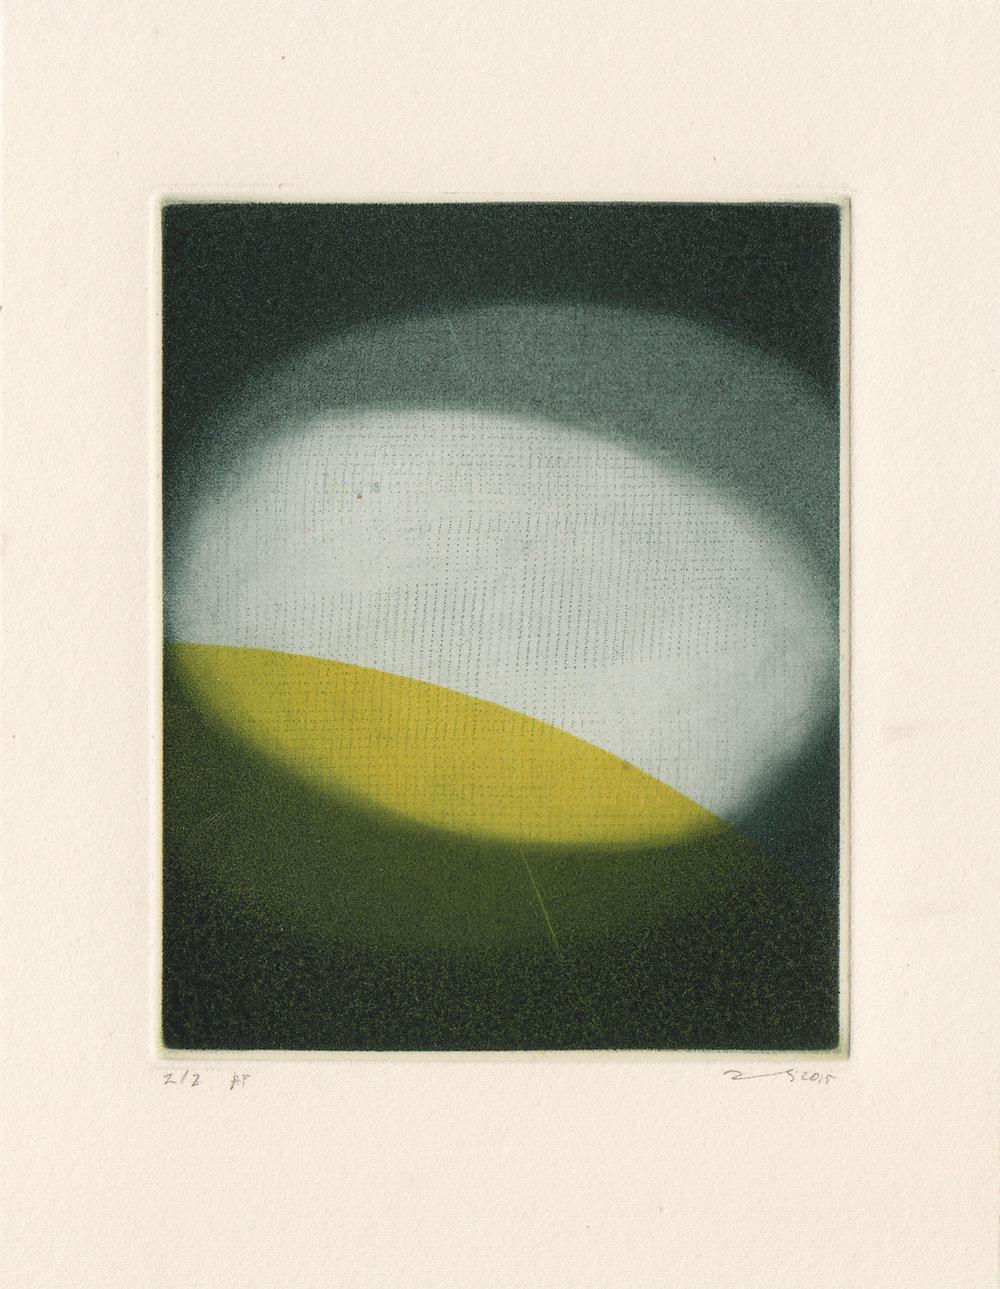 MAJLA ZENELI, A Double Forefront, 2015, Mezzotinto-Druck, 10 x 8 cm